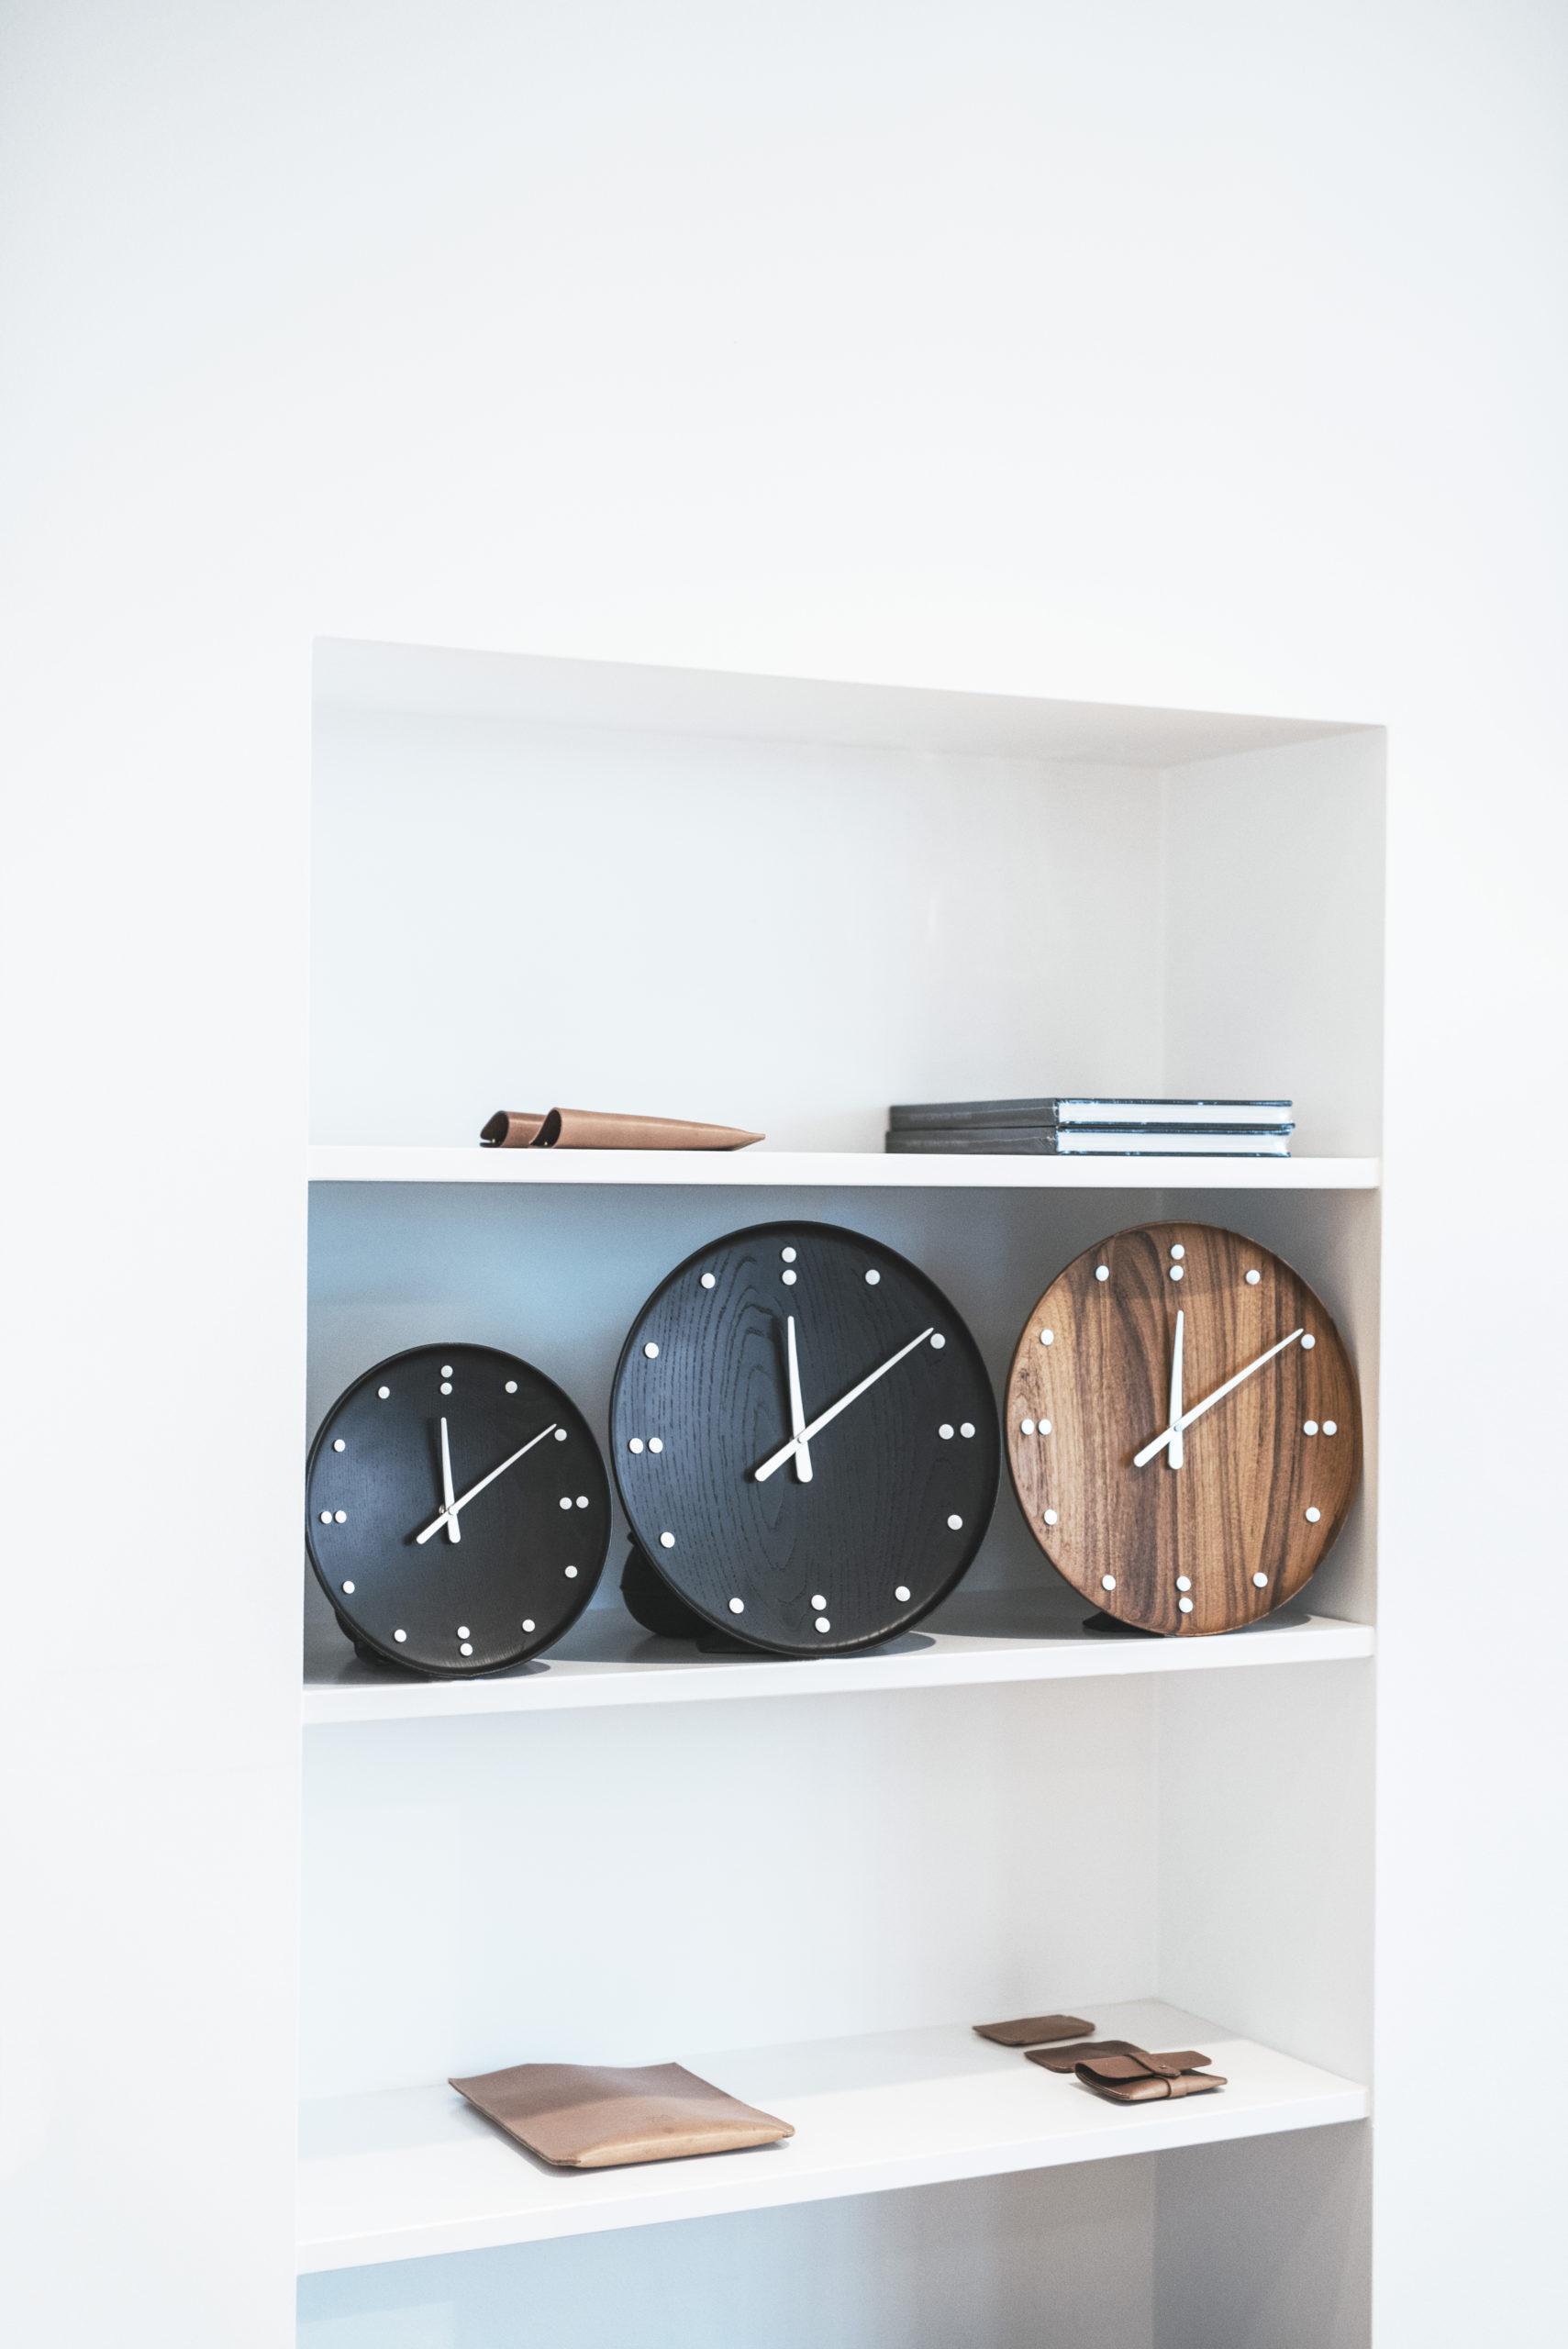 Architectmade-FJ-Clock-Wall-Clock-Teak-and-Ash-Wood-Denmark-Finn-Juhl-6